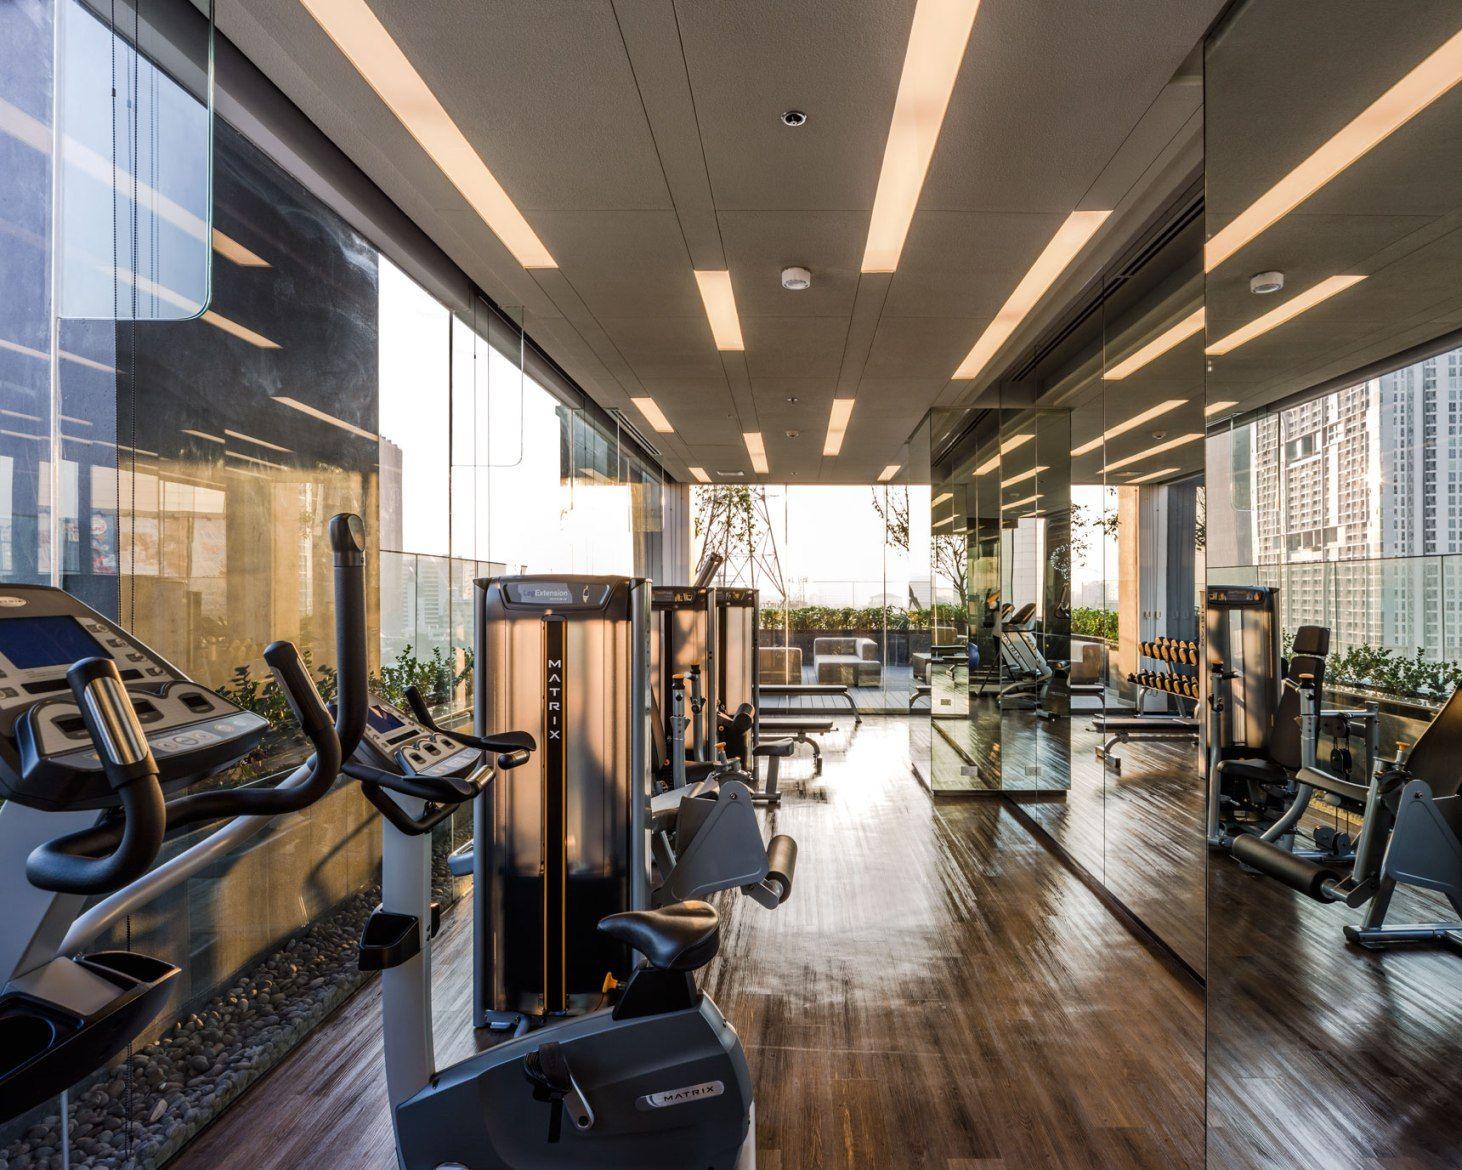 M Ladprao By Major Development At Home Gym Gym Design Gym Interior